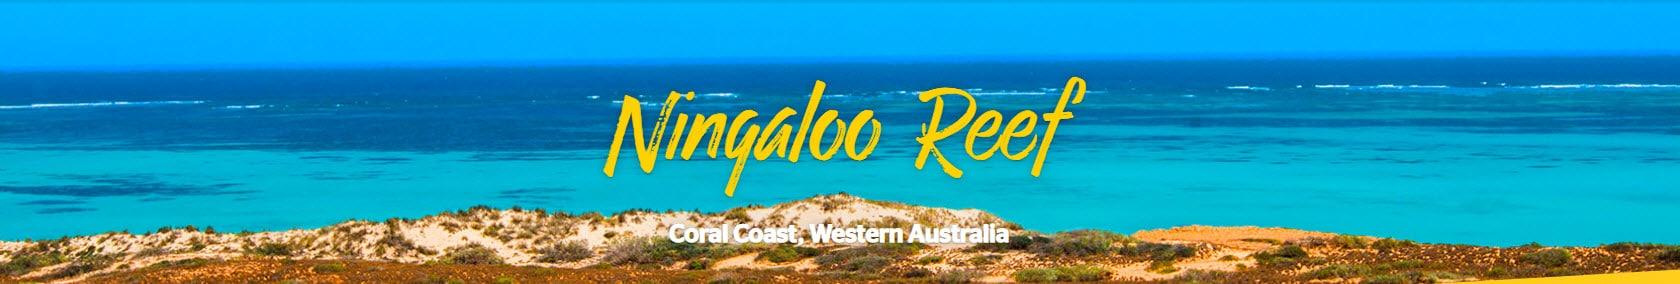 Ningaloo Reef Resort - Ningaloo